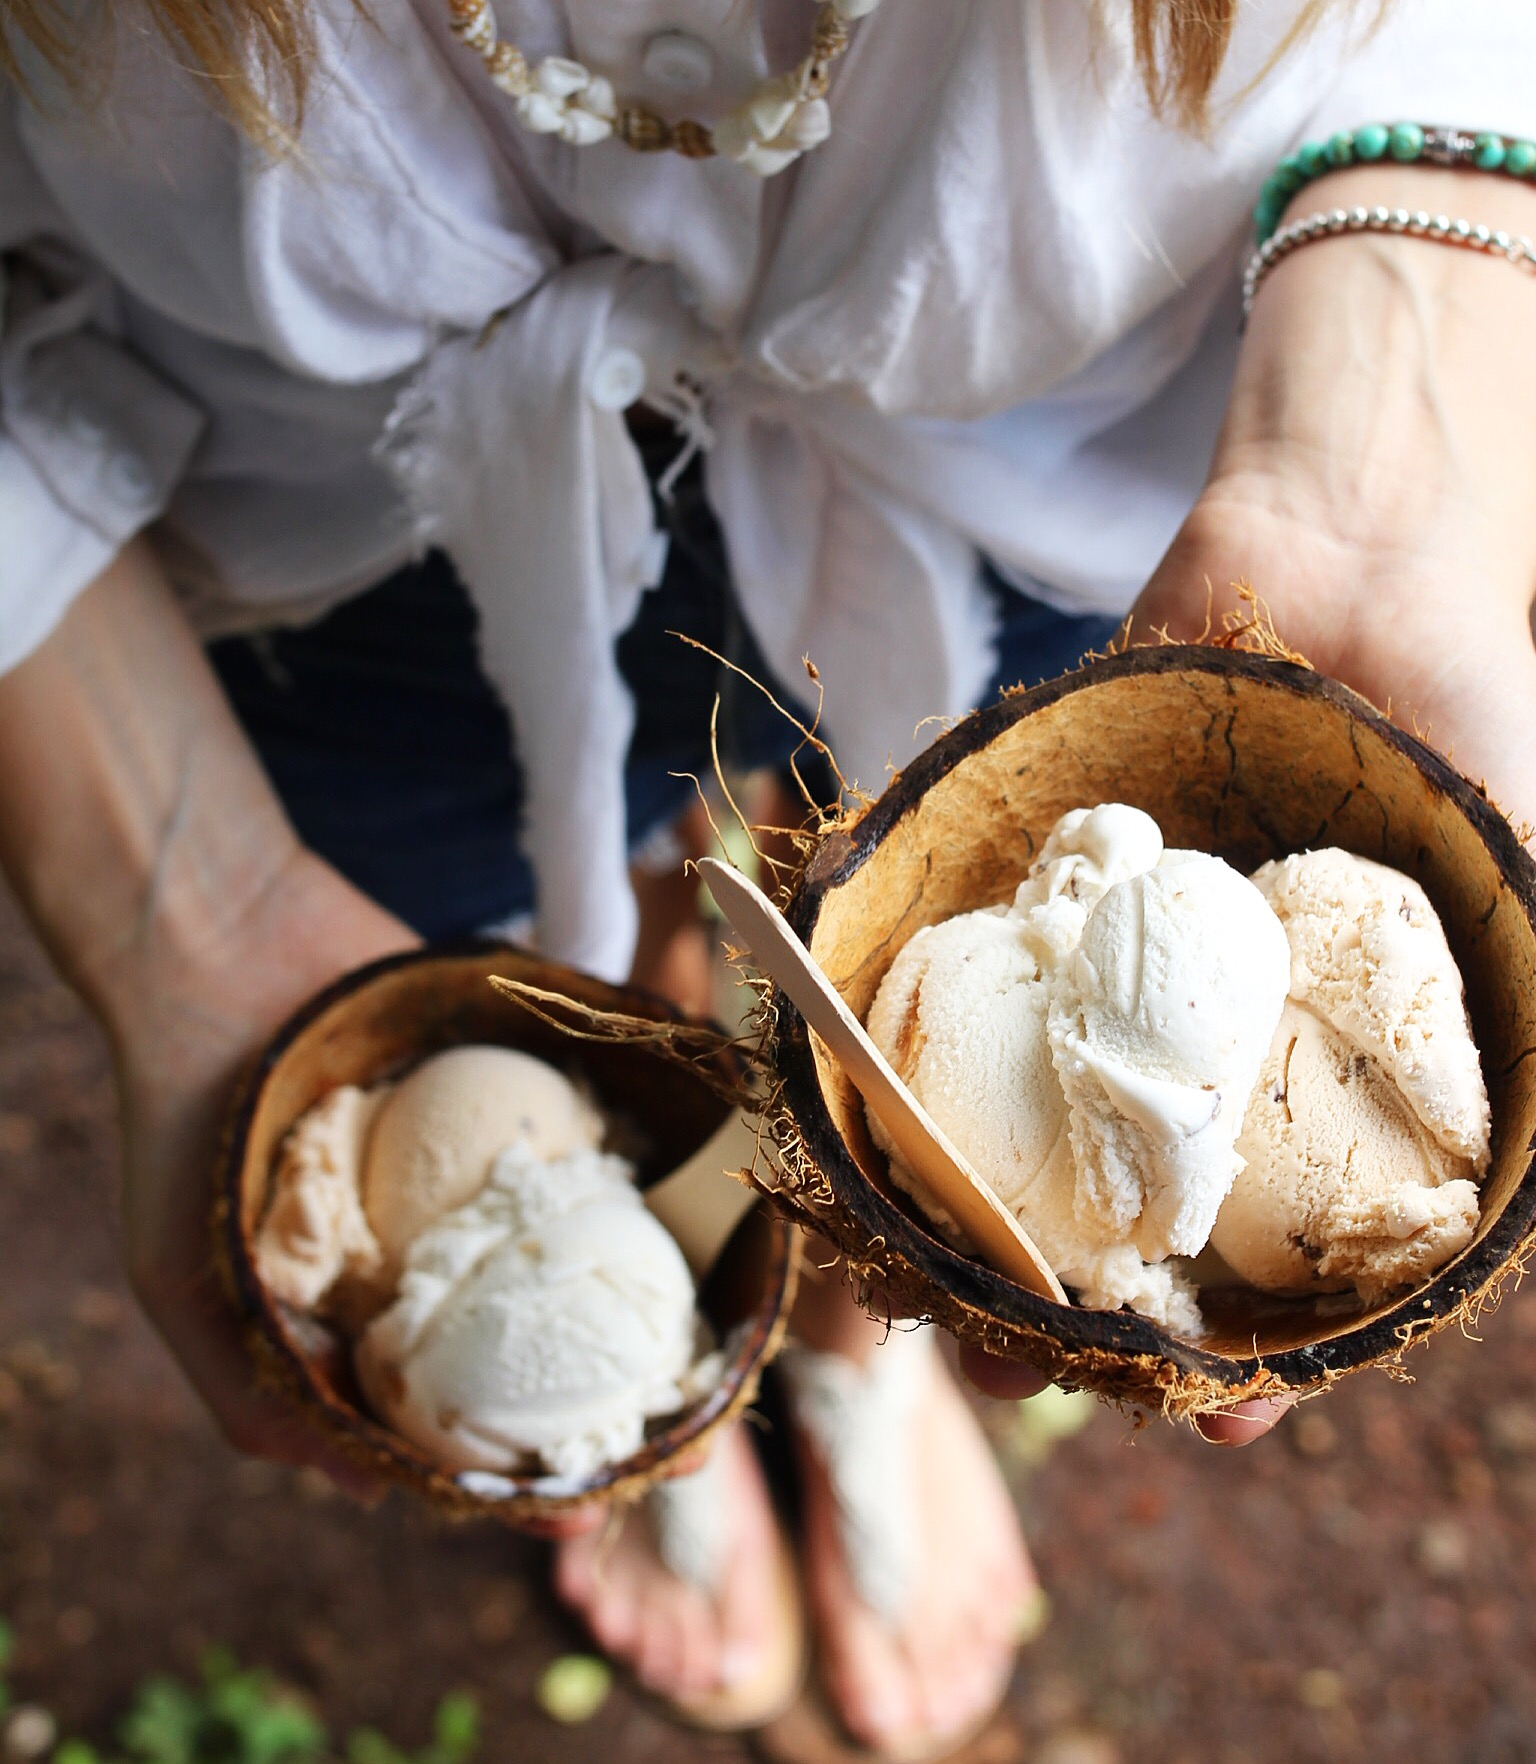 Coconut glens vegan ice cream